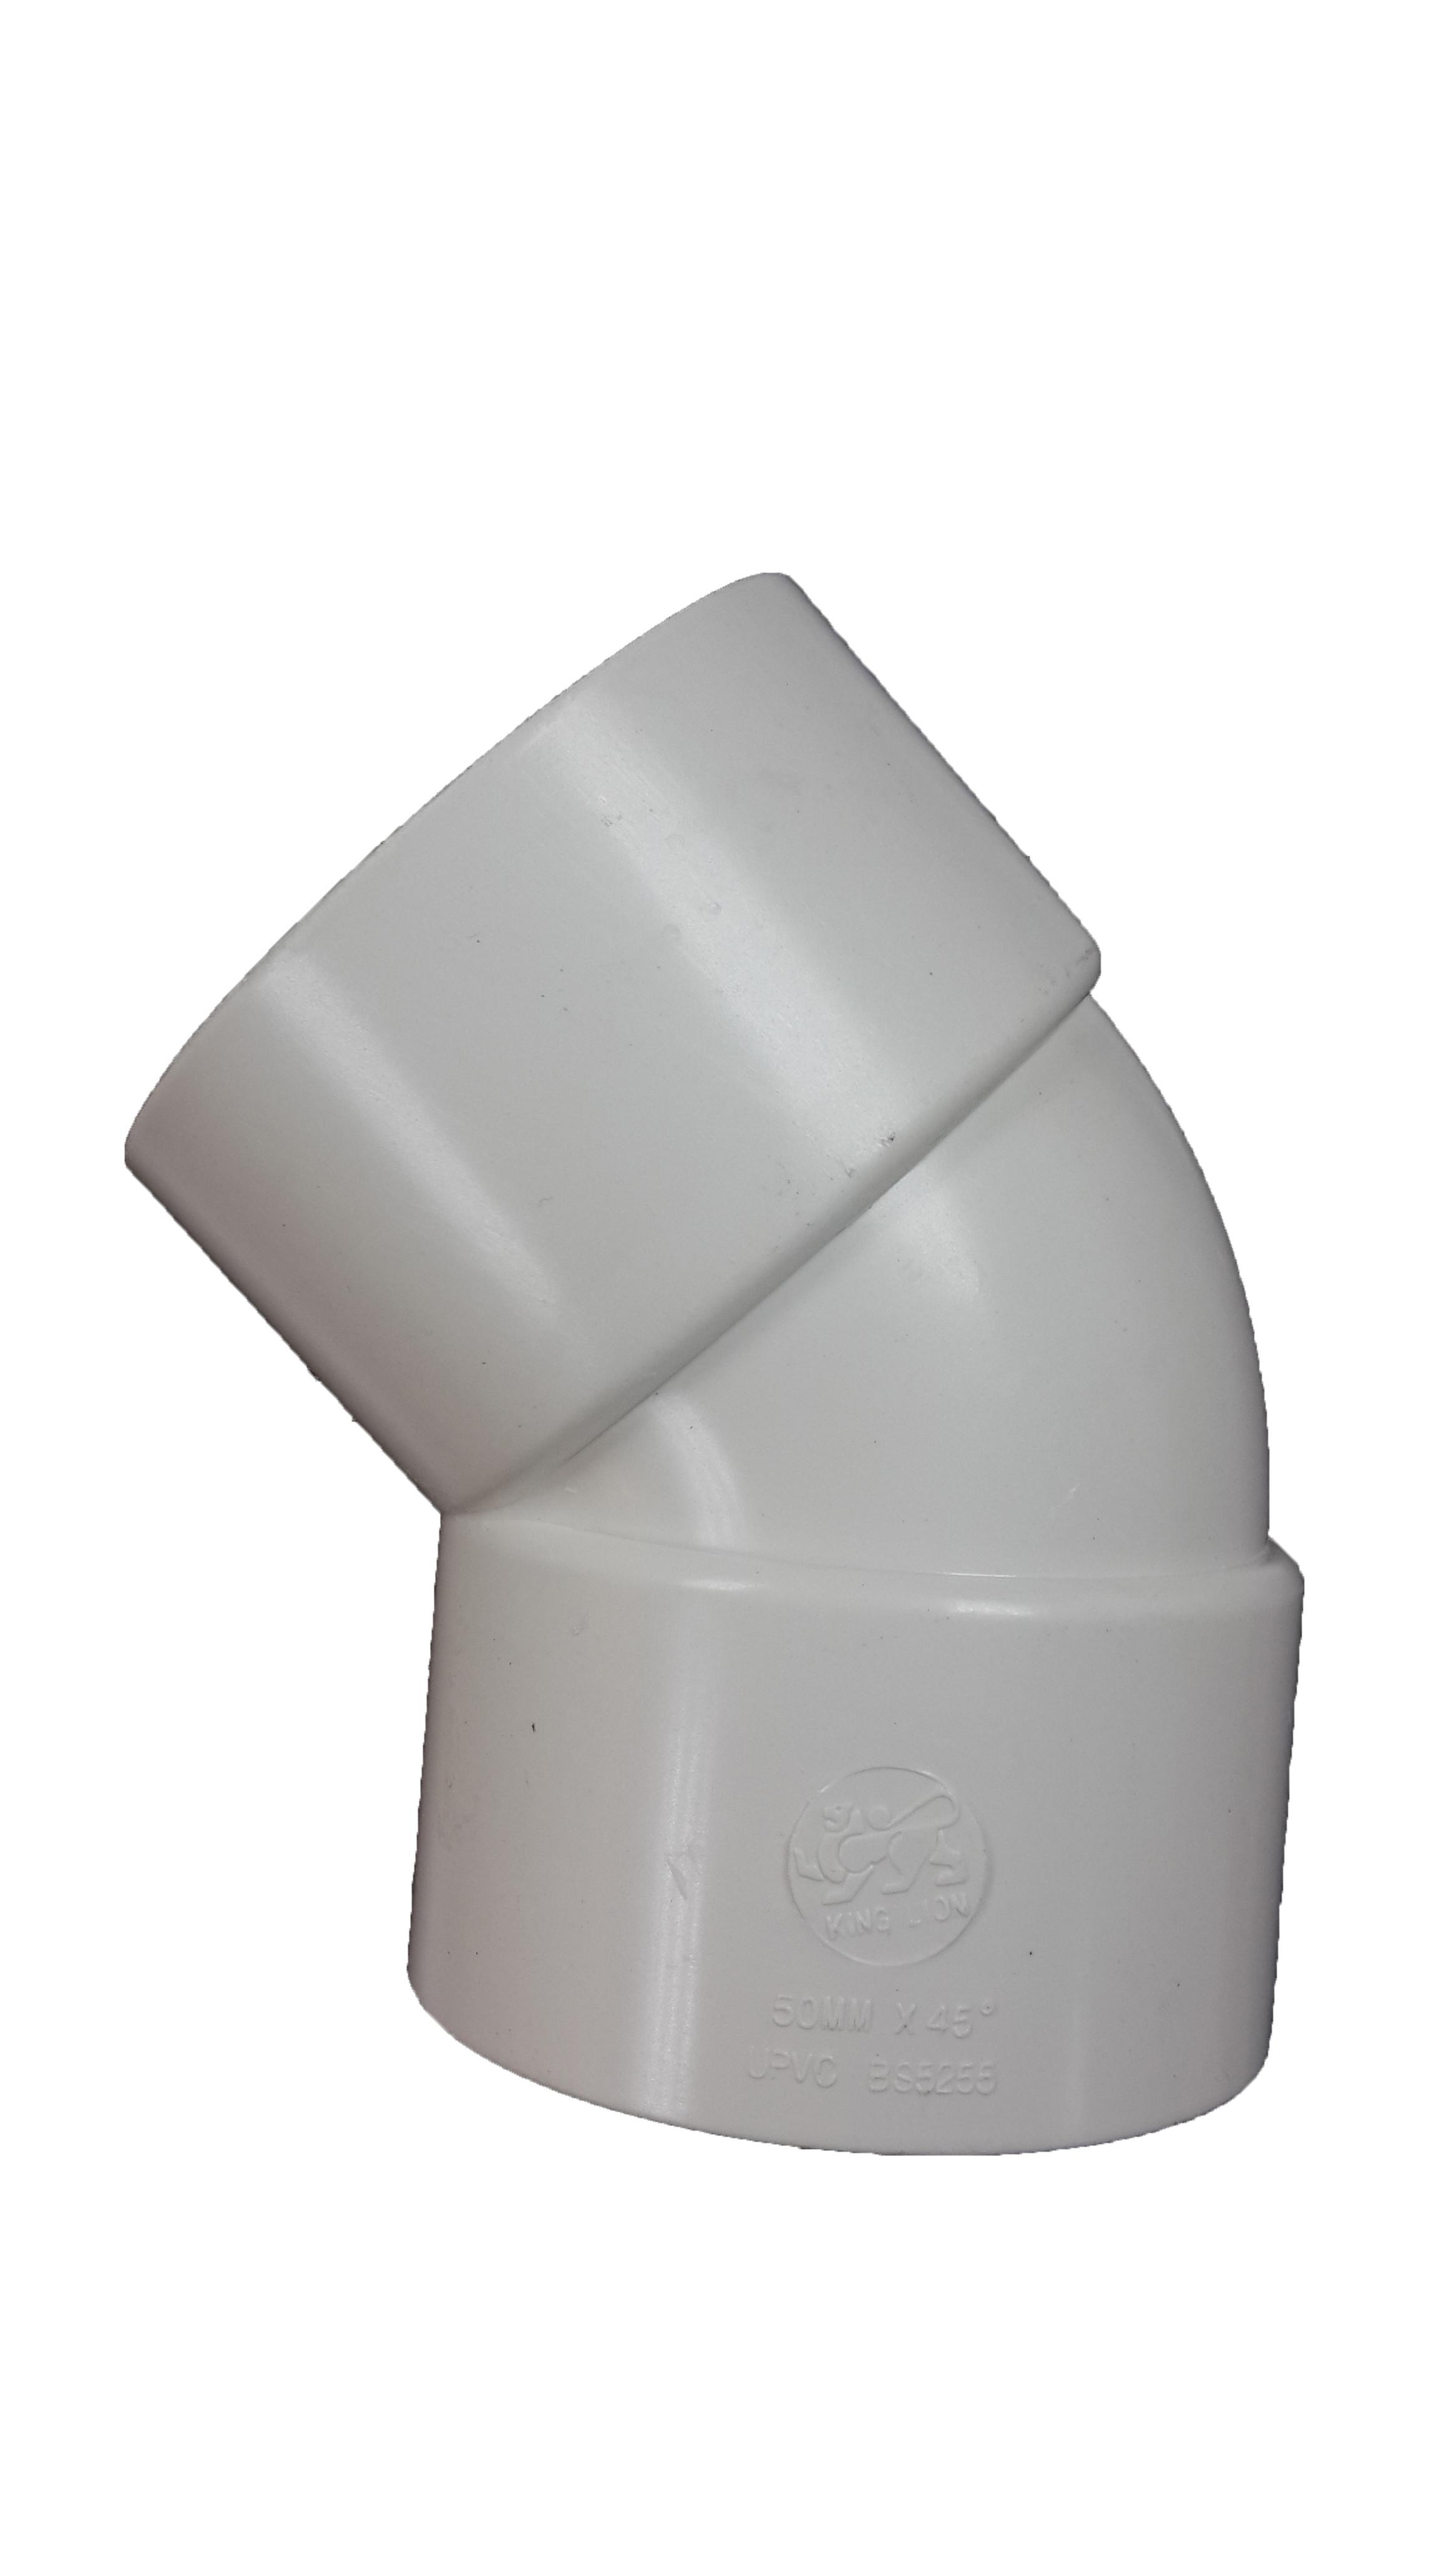 "1 1/4"" Aqua ABS 45o Elbow (32mm) -0"